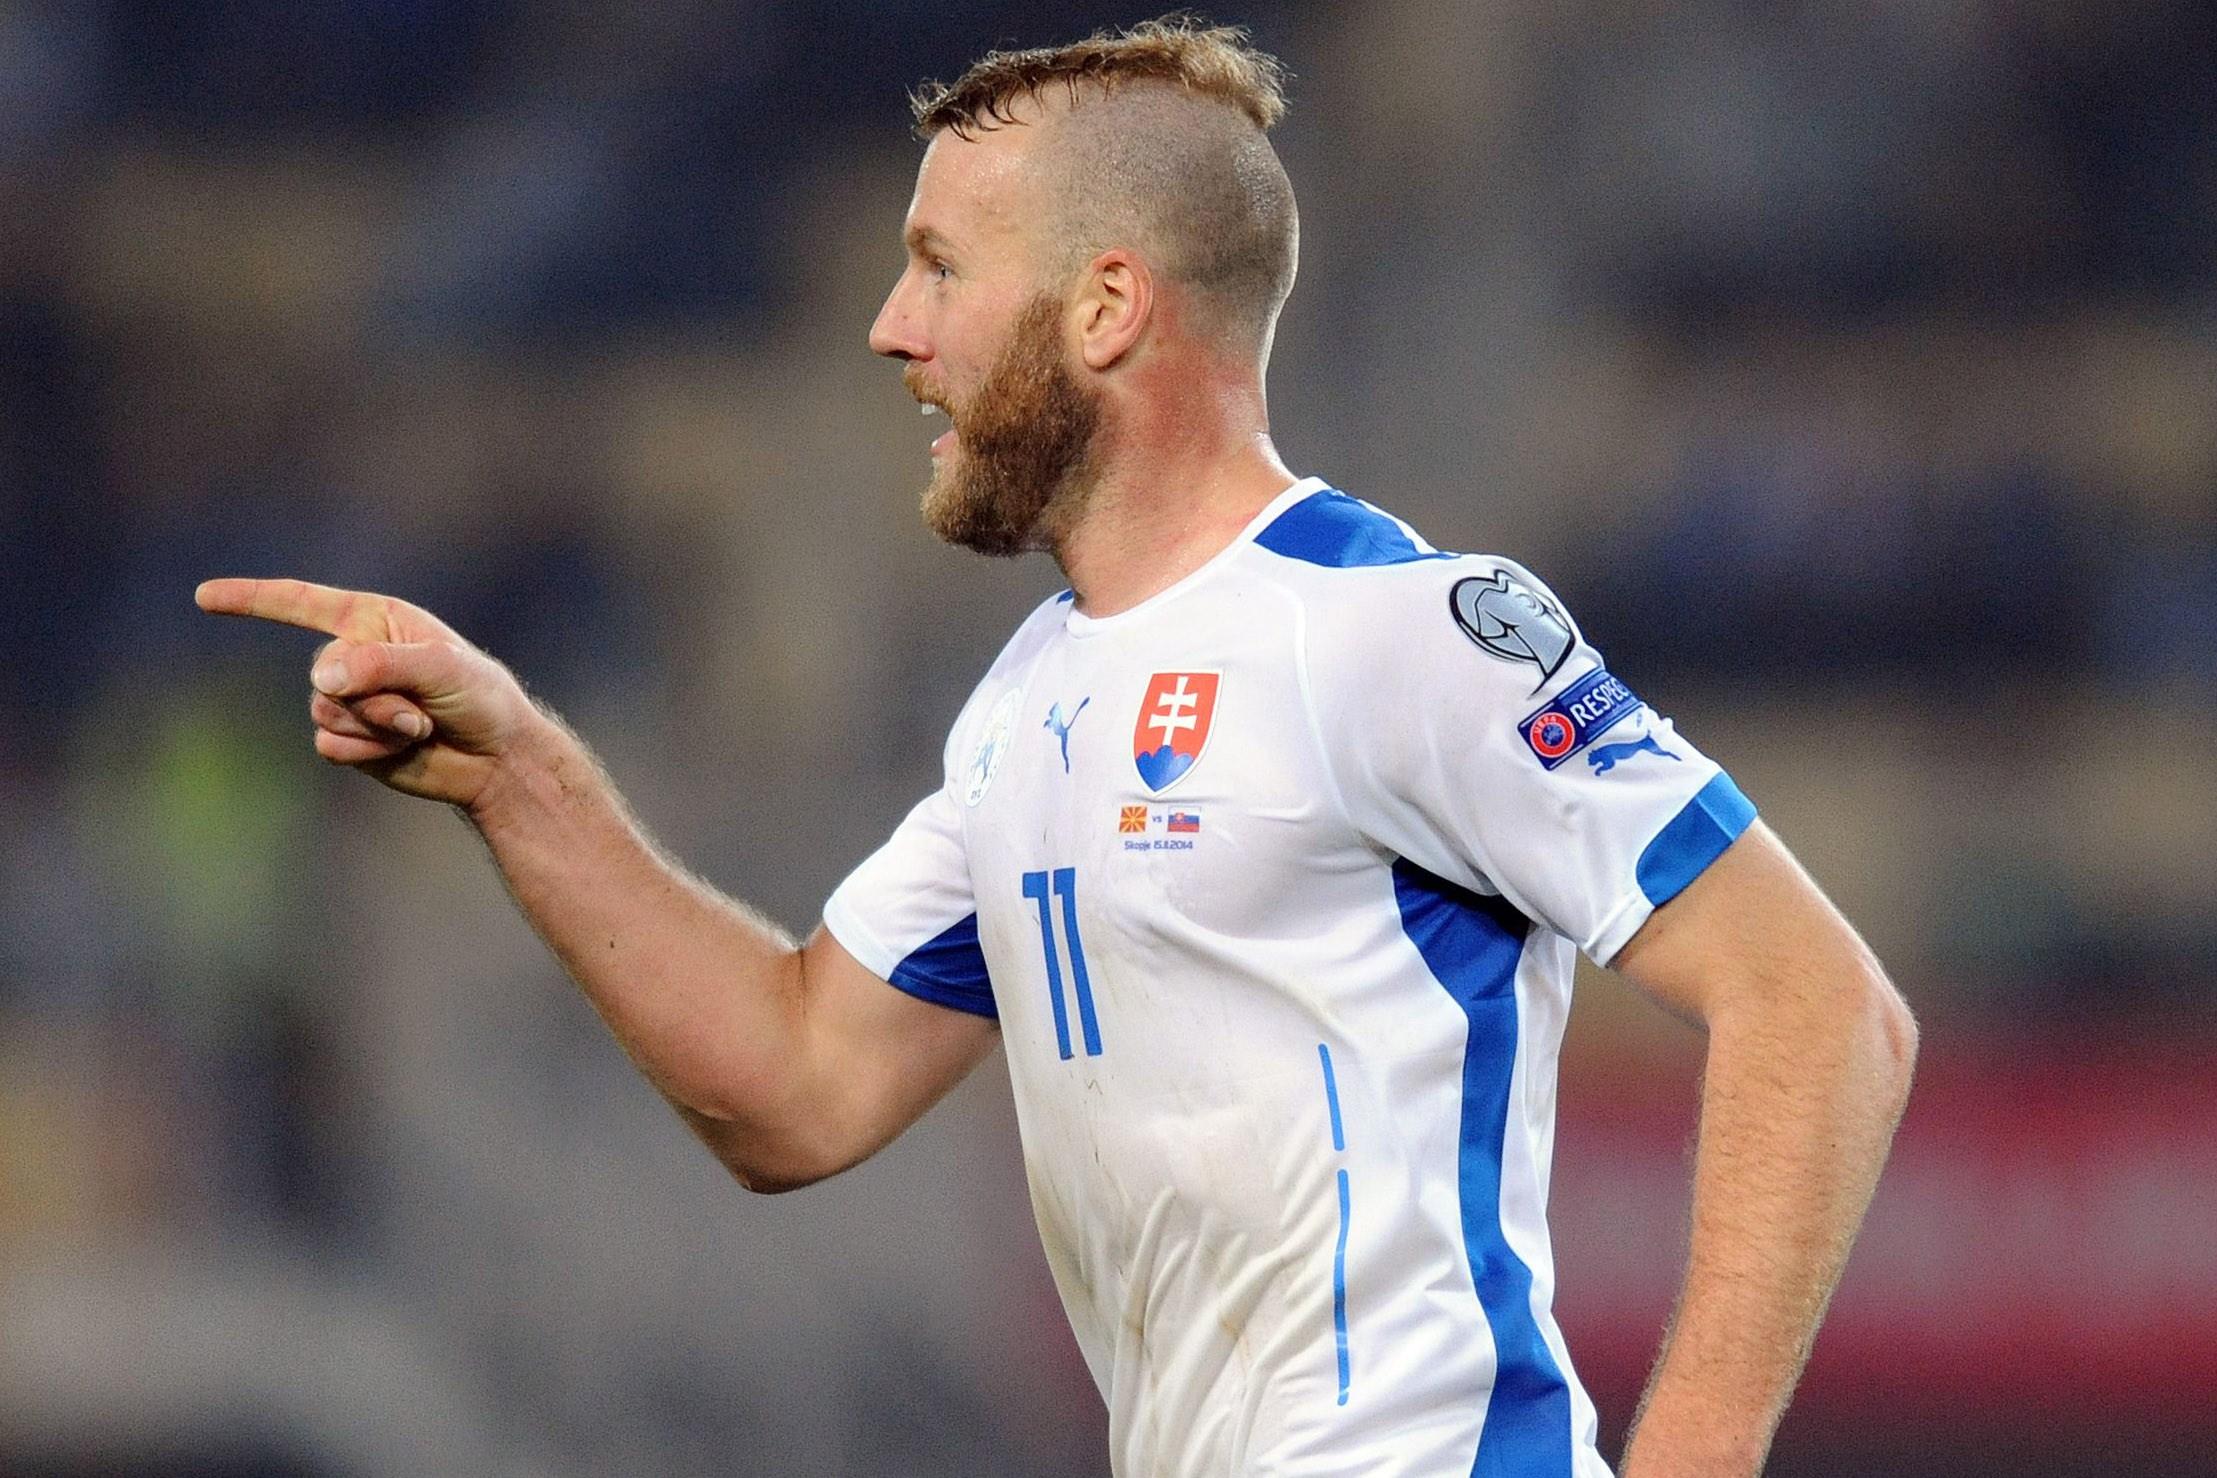 Nemec Scored For Slovakia